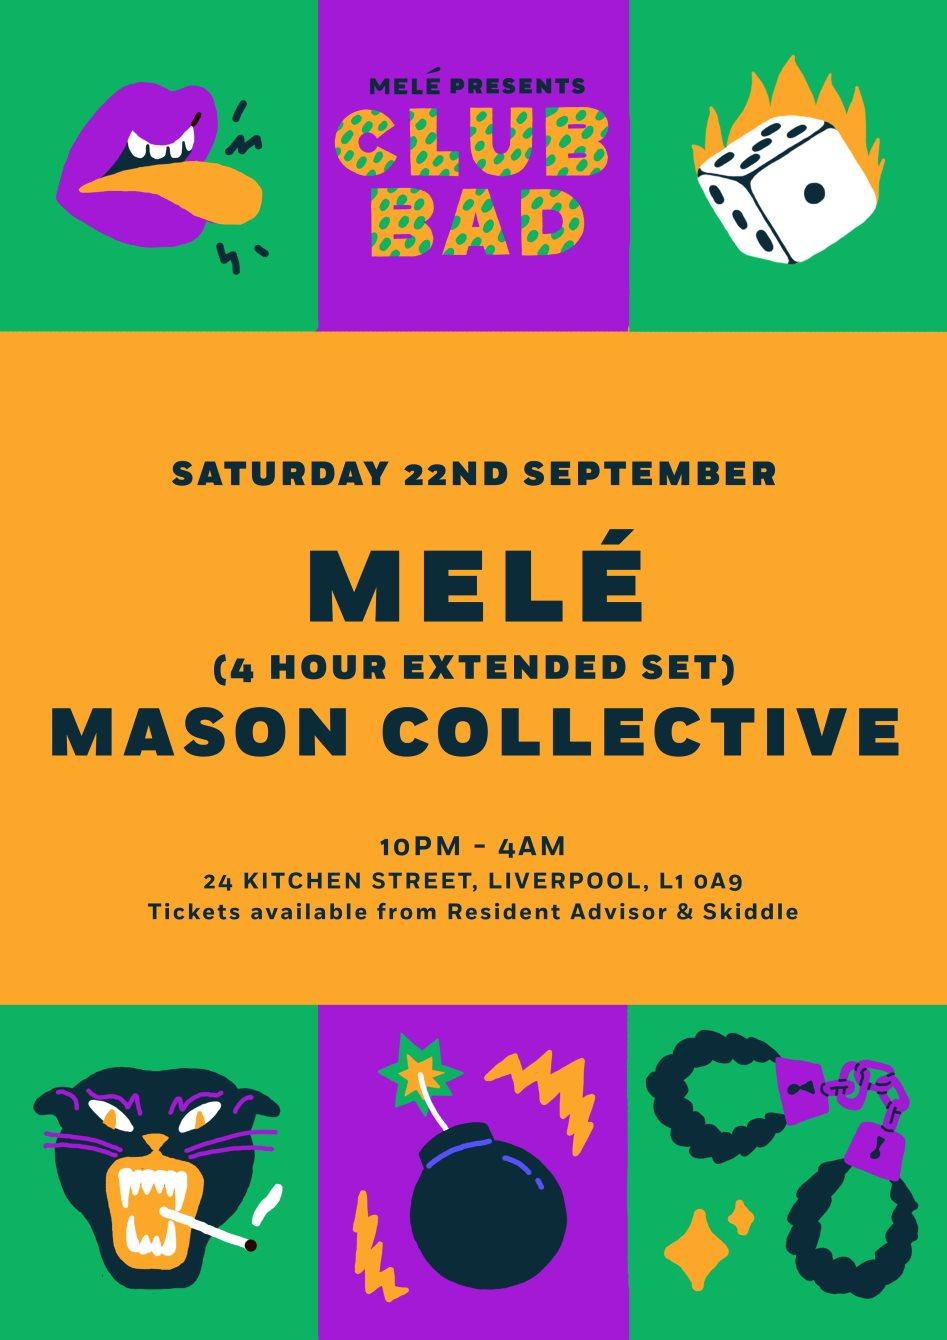 ra club bad melé extended set mason collective at 24 kitchen